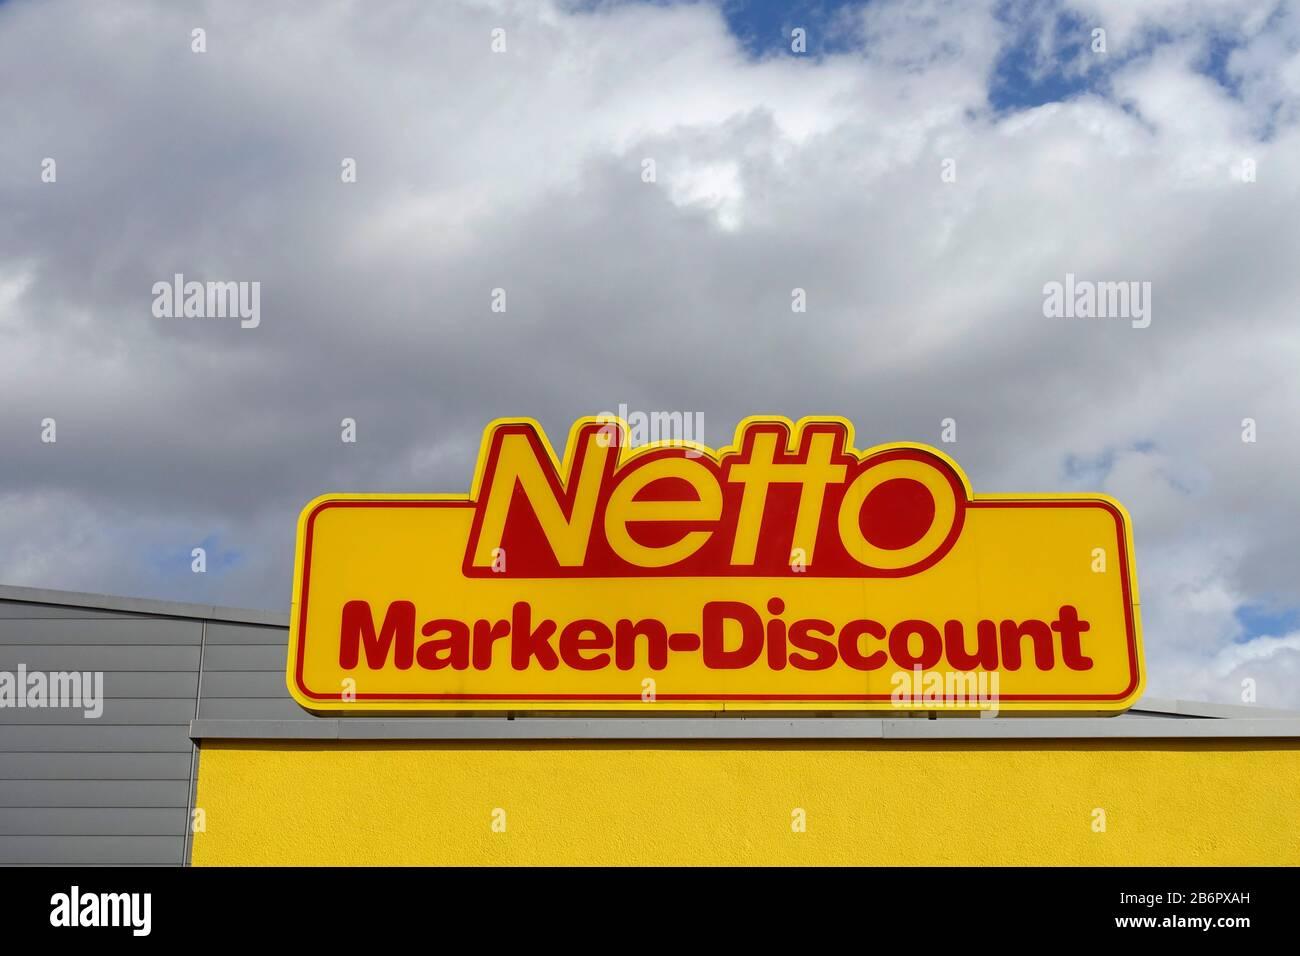 Netto Marken Discount in Berlin Stockfotografie   Alamy